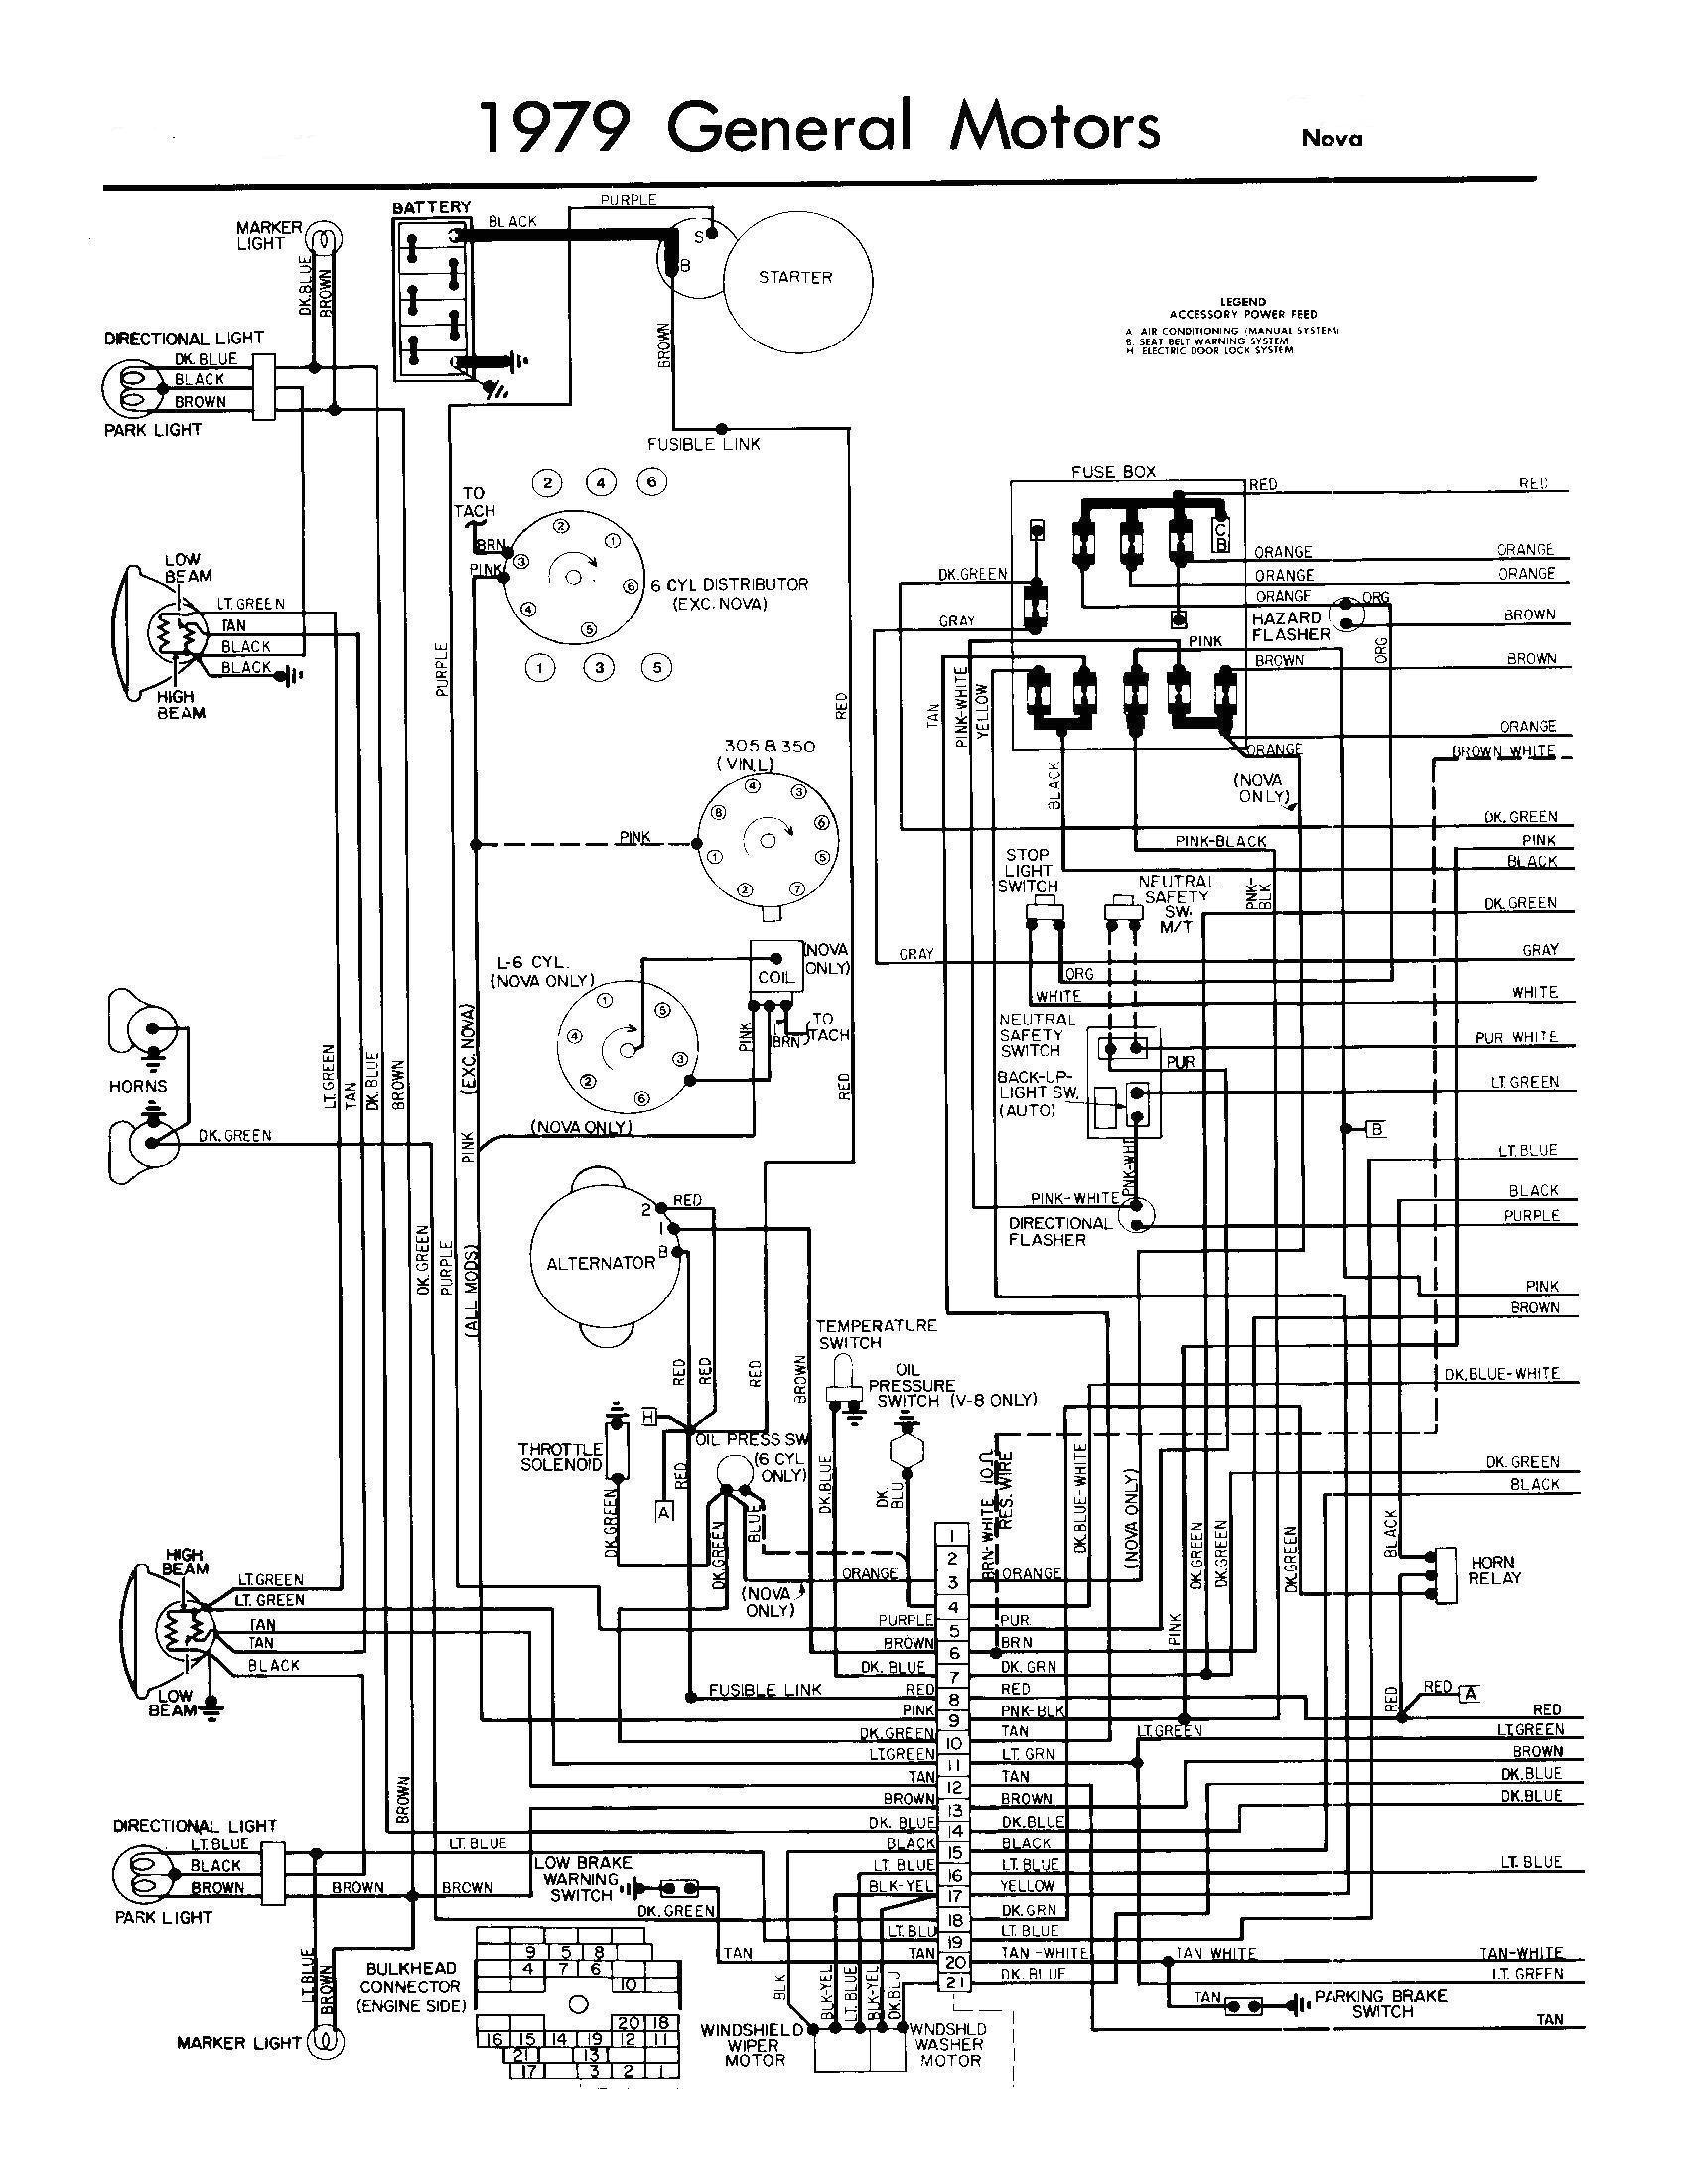 1978 toyota hilux engine diagram wiring diagram used 1978 toyota hilux engine diagram